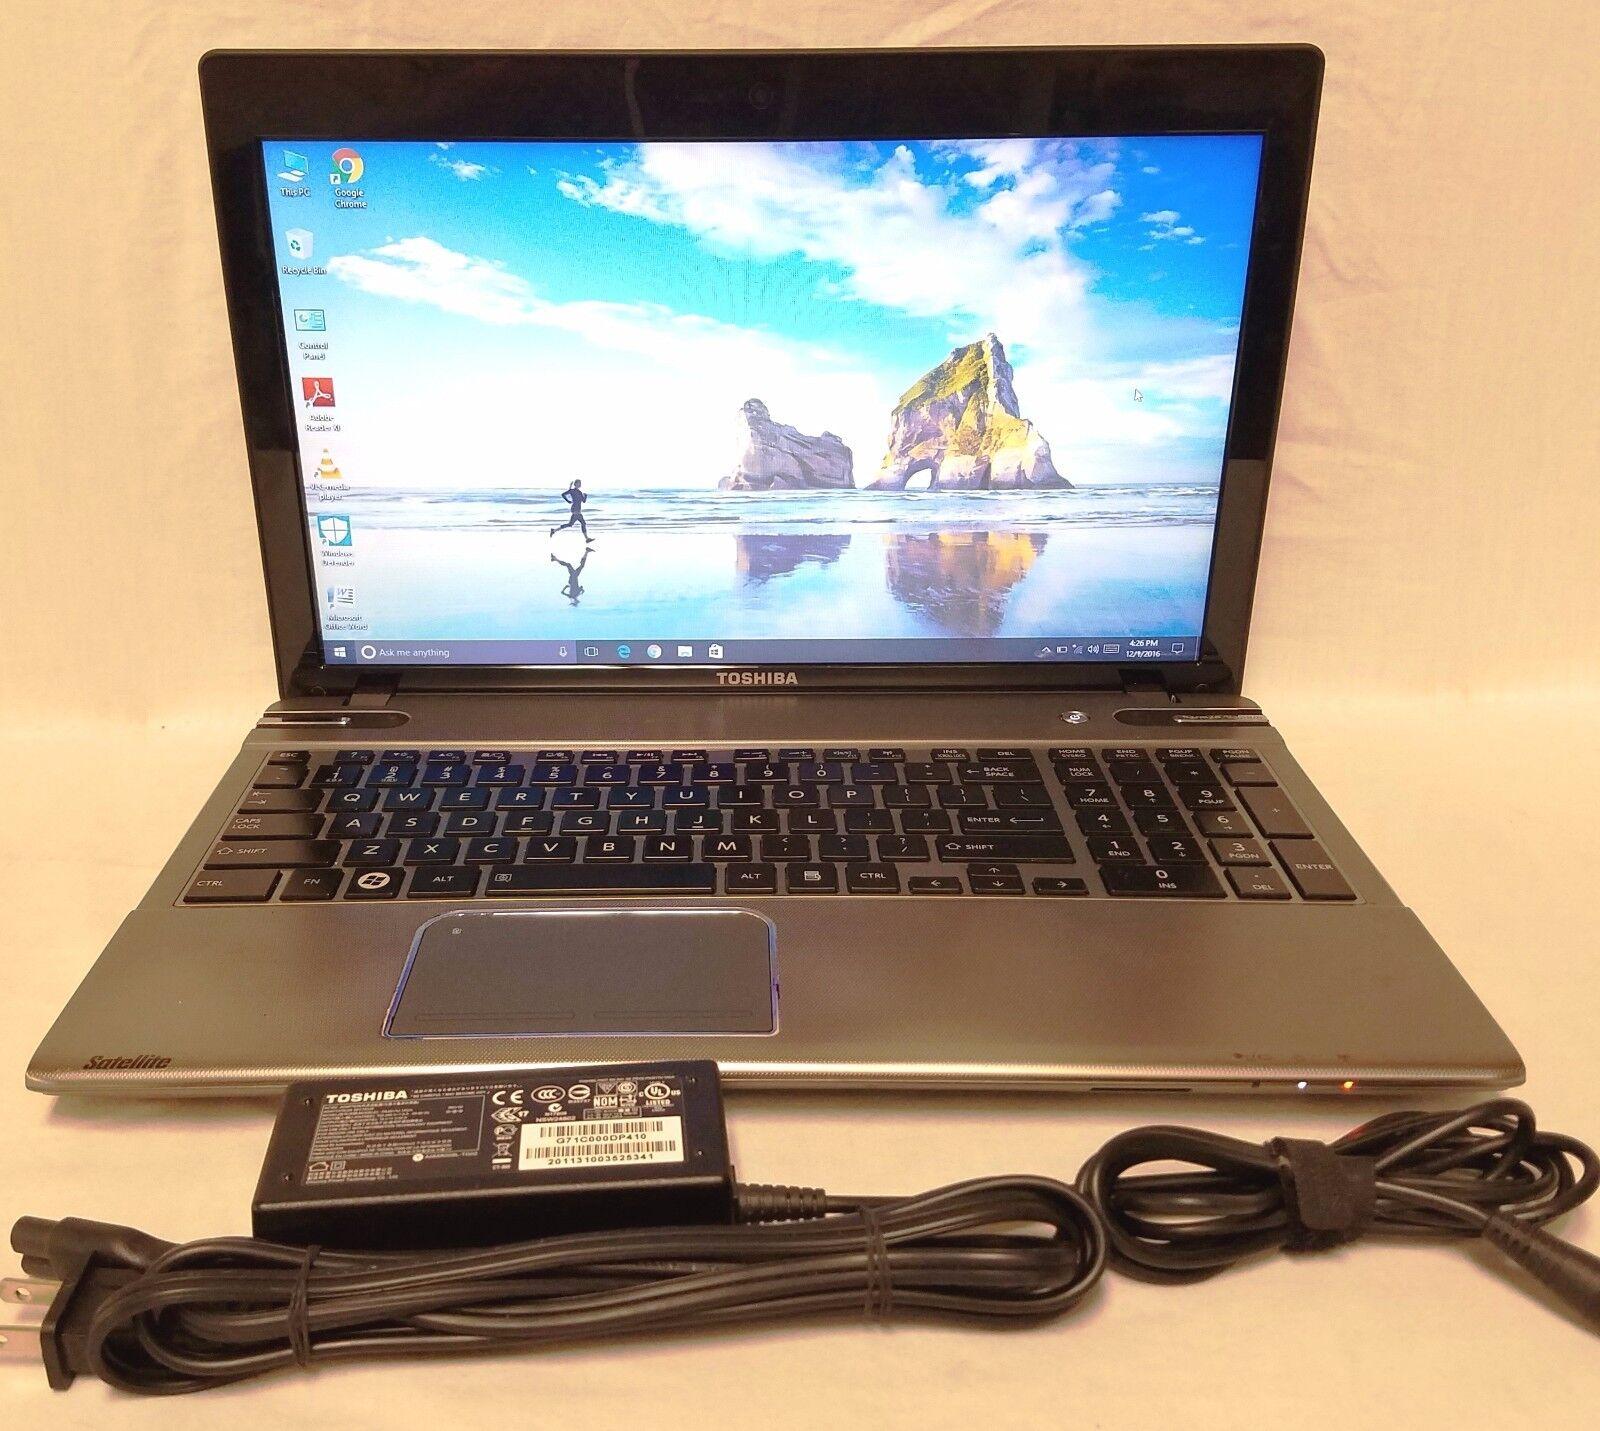 TOSHIBA SATELLITE-P855-S5200 | CORE i7 3610QM 2.30GHZ | 750GB | 8GB RAM Win 10